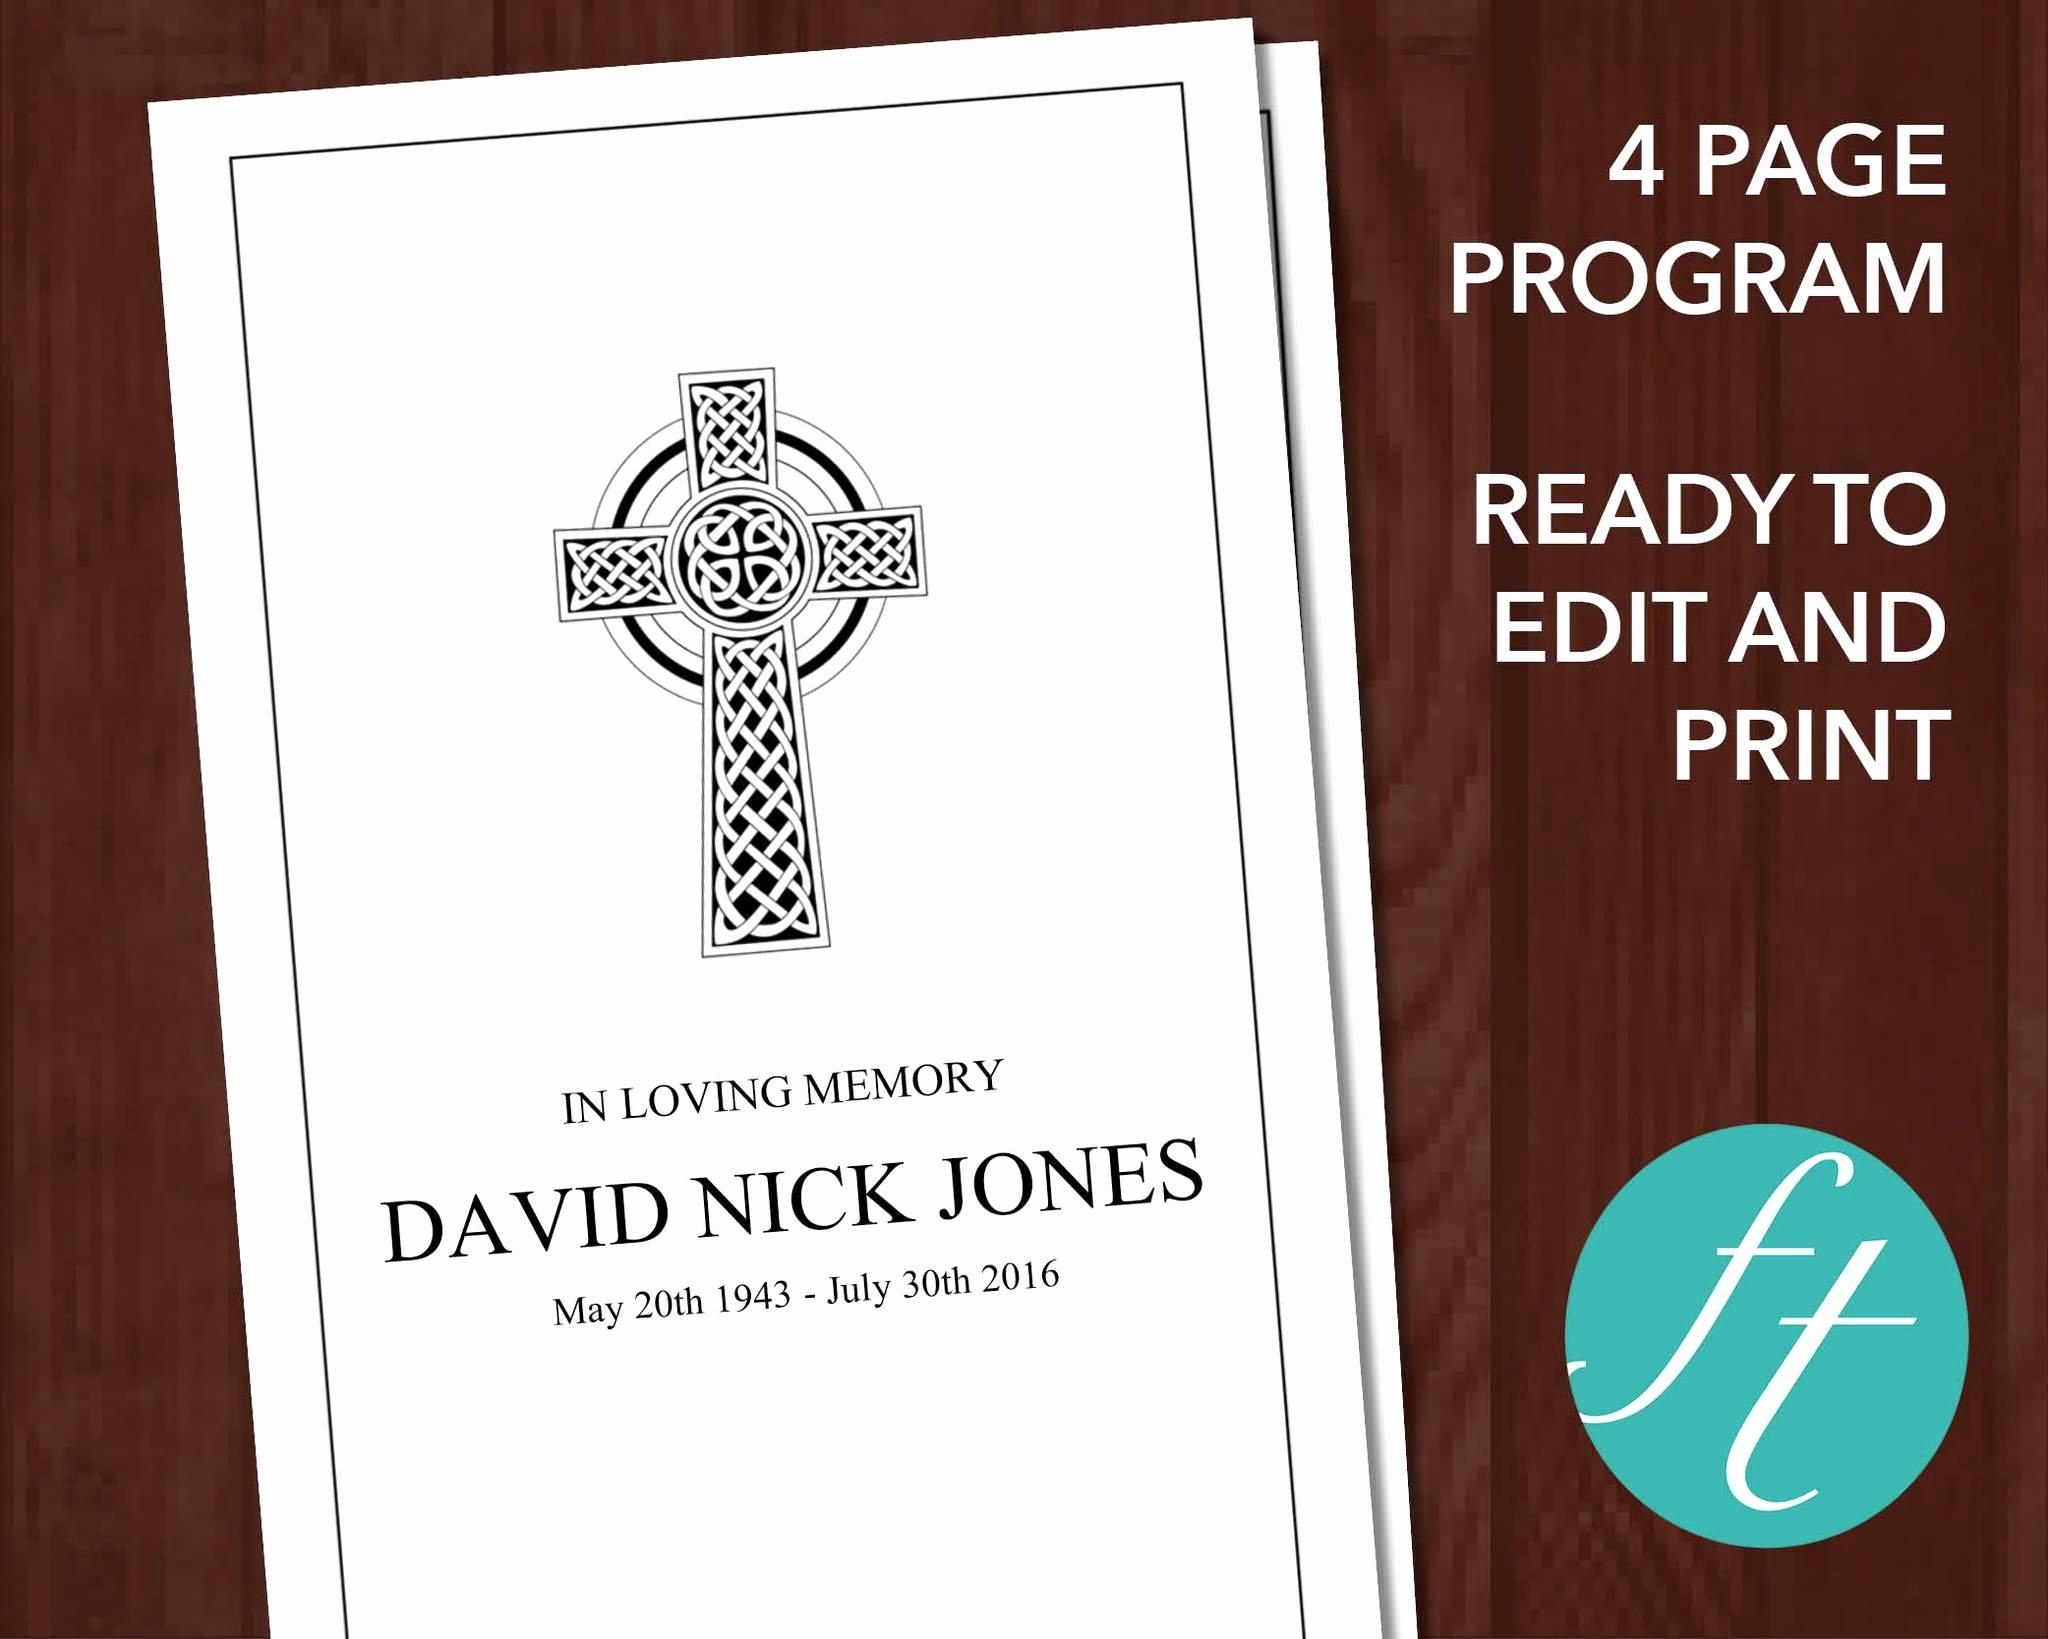 Catholic Funeral Program Templates Inspirational 4 Page Catholic Cross Funeral Program Template – Funeral